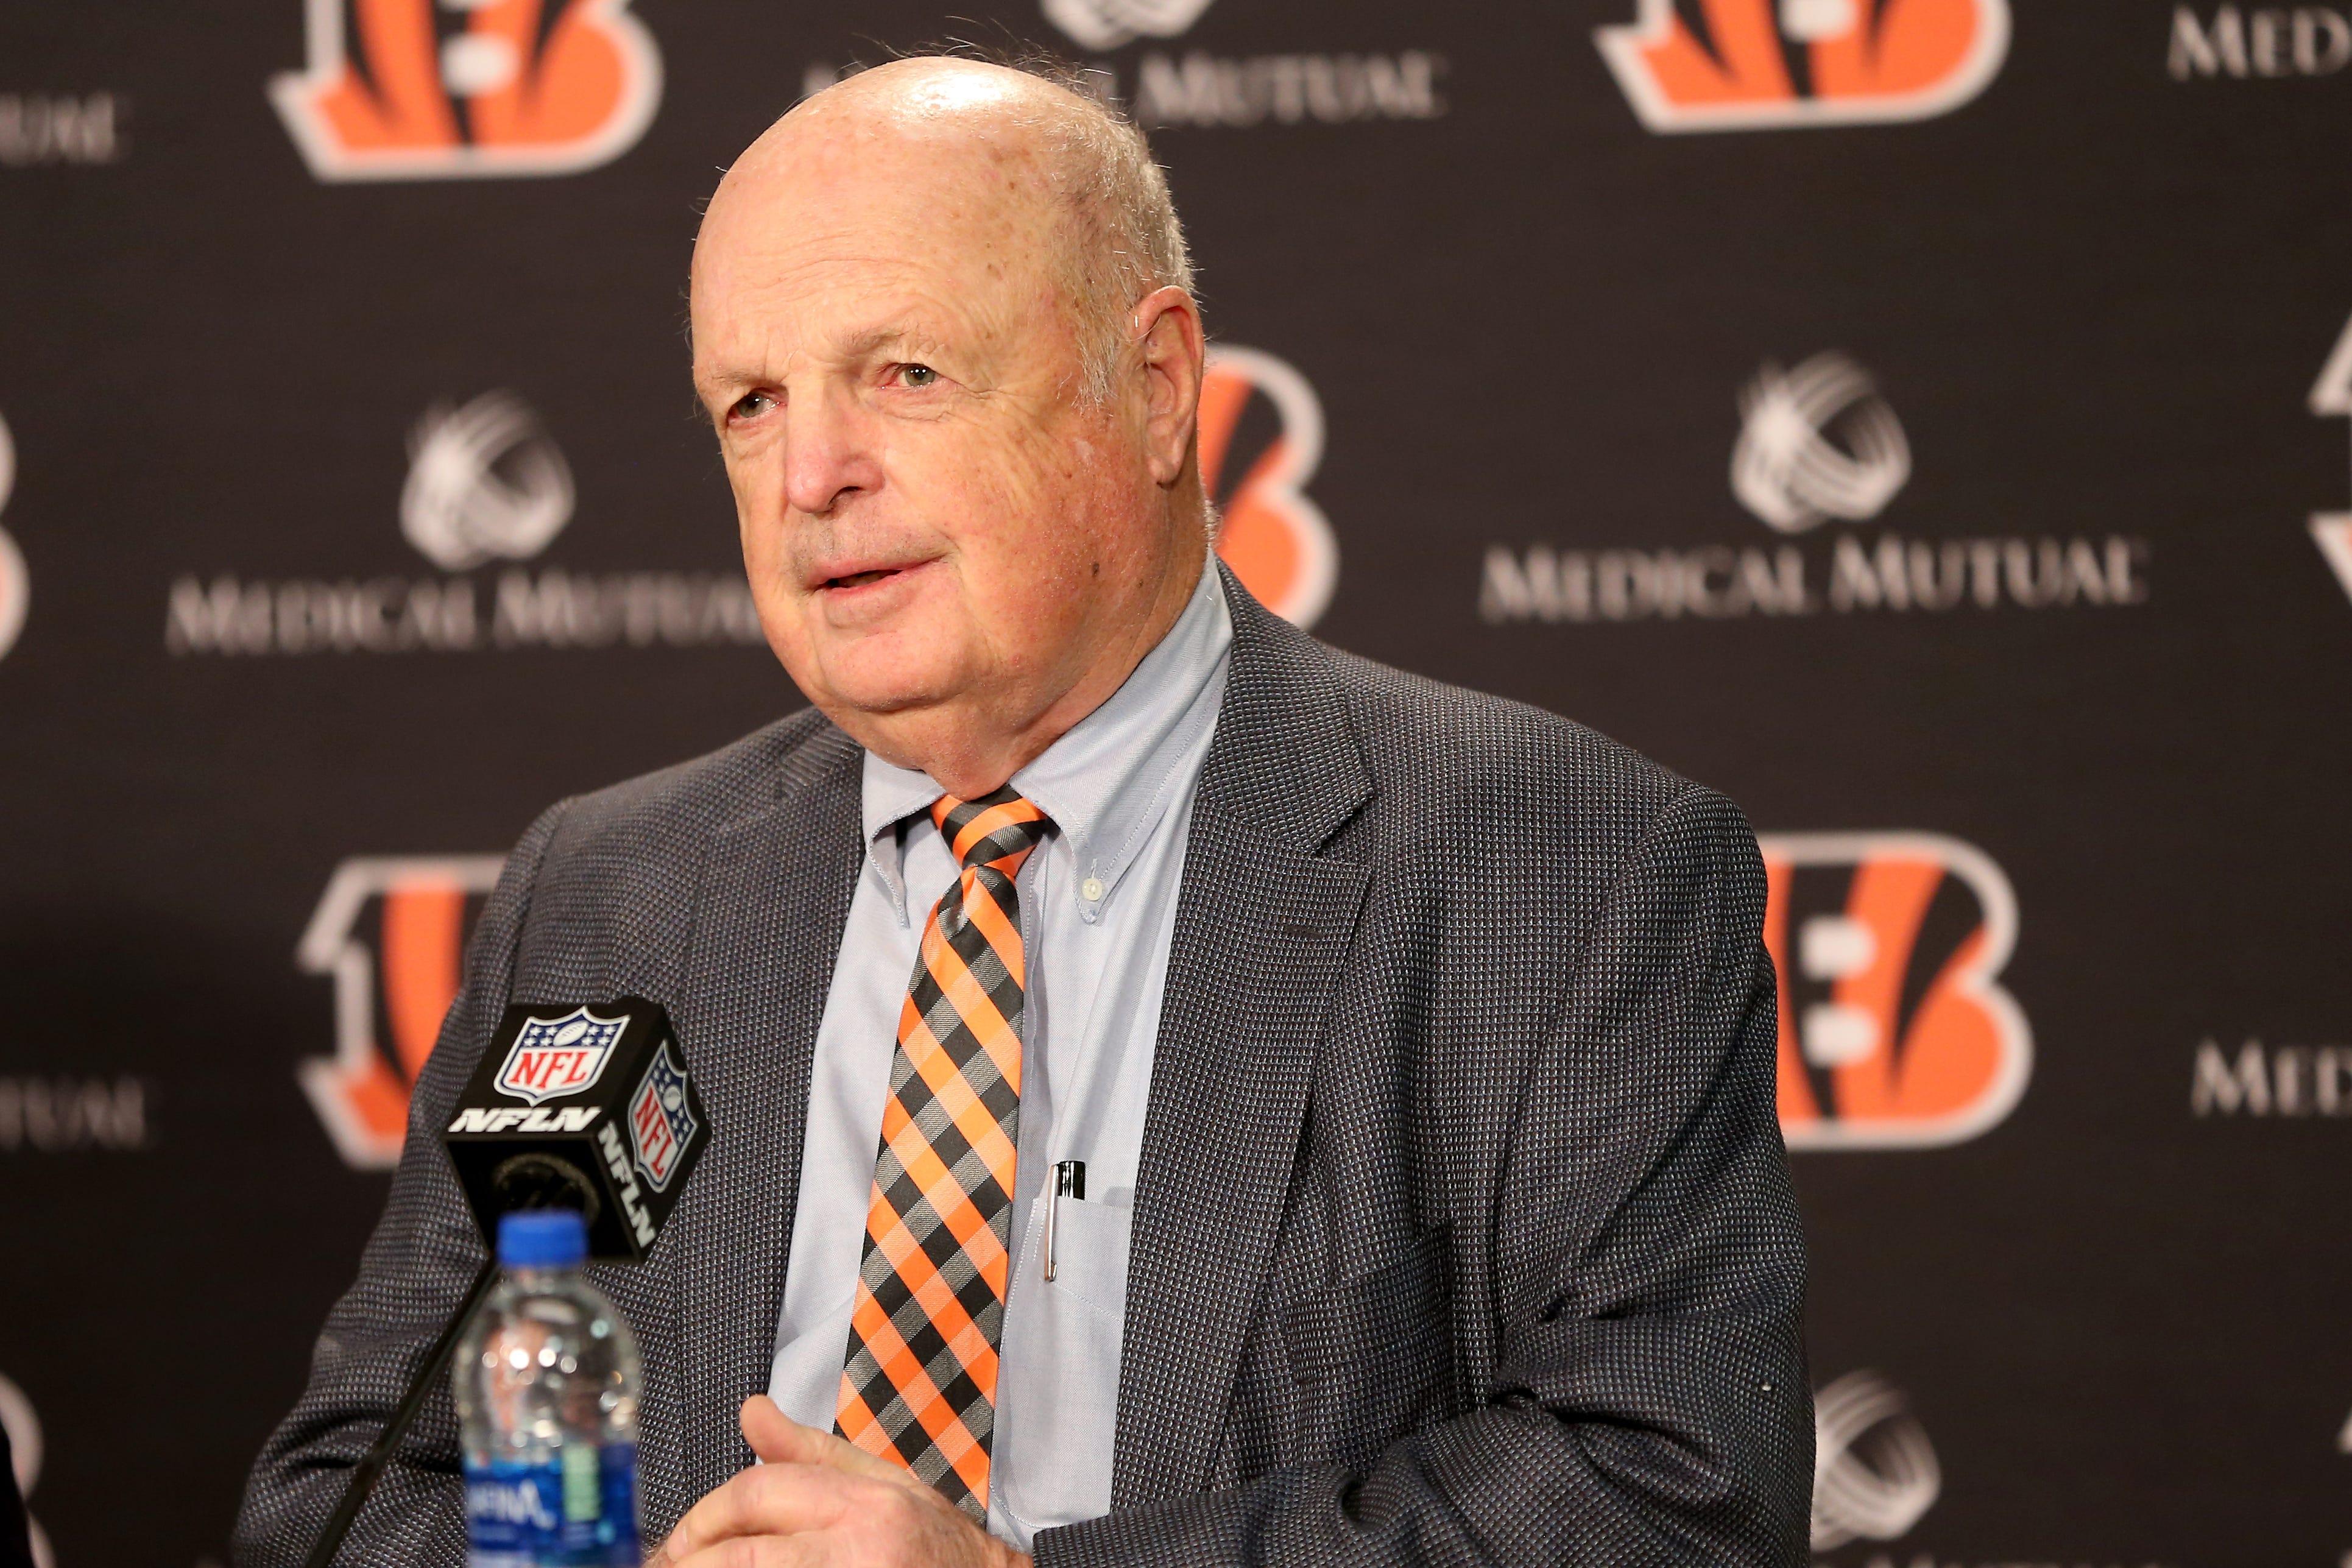 5 things Cincinnati Bengals owner Mike Brown said at NFL annual meetings